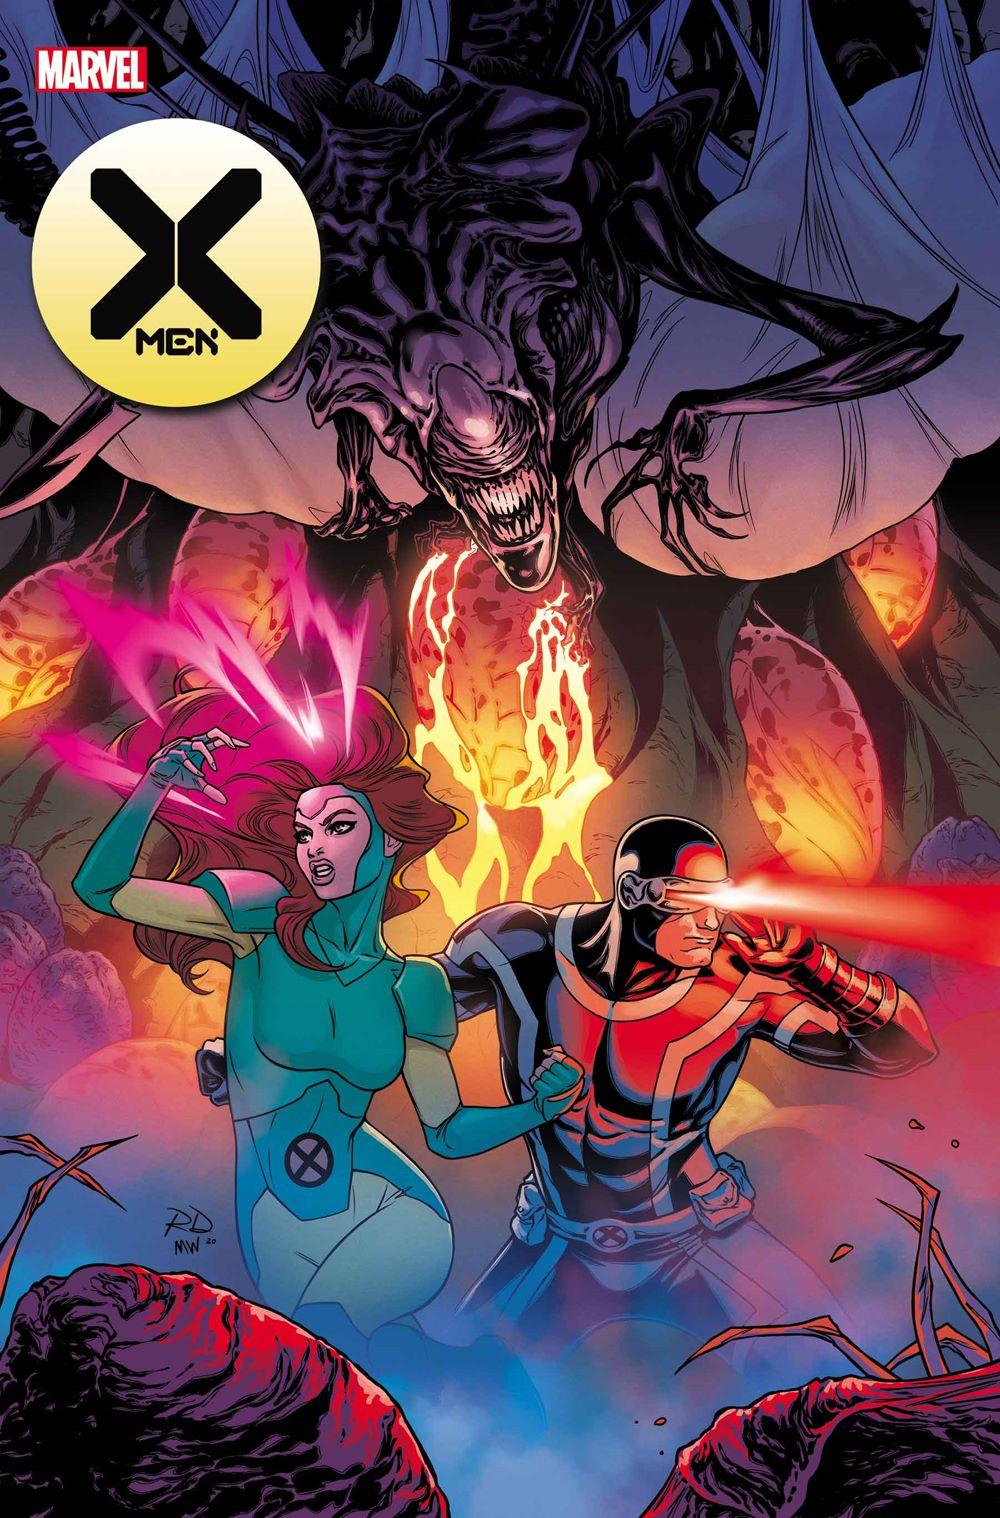 XMEN2019017_DautermanVar Marvel Comics January 2021 Solicitations